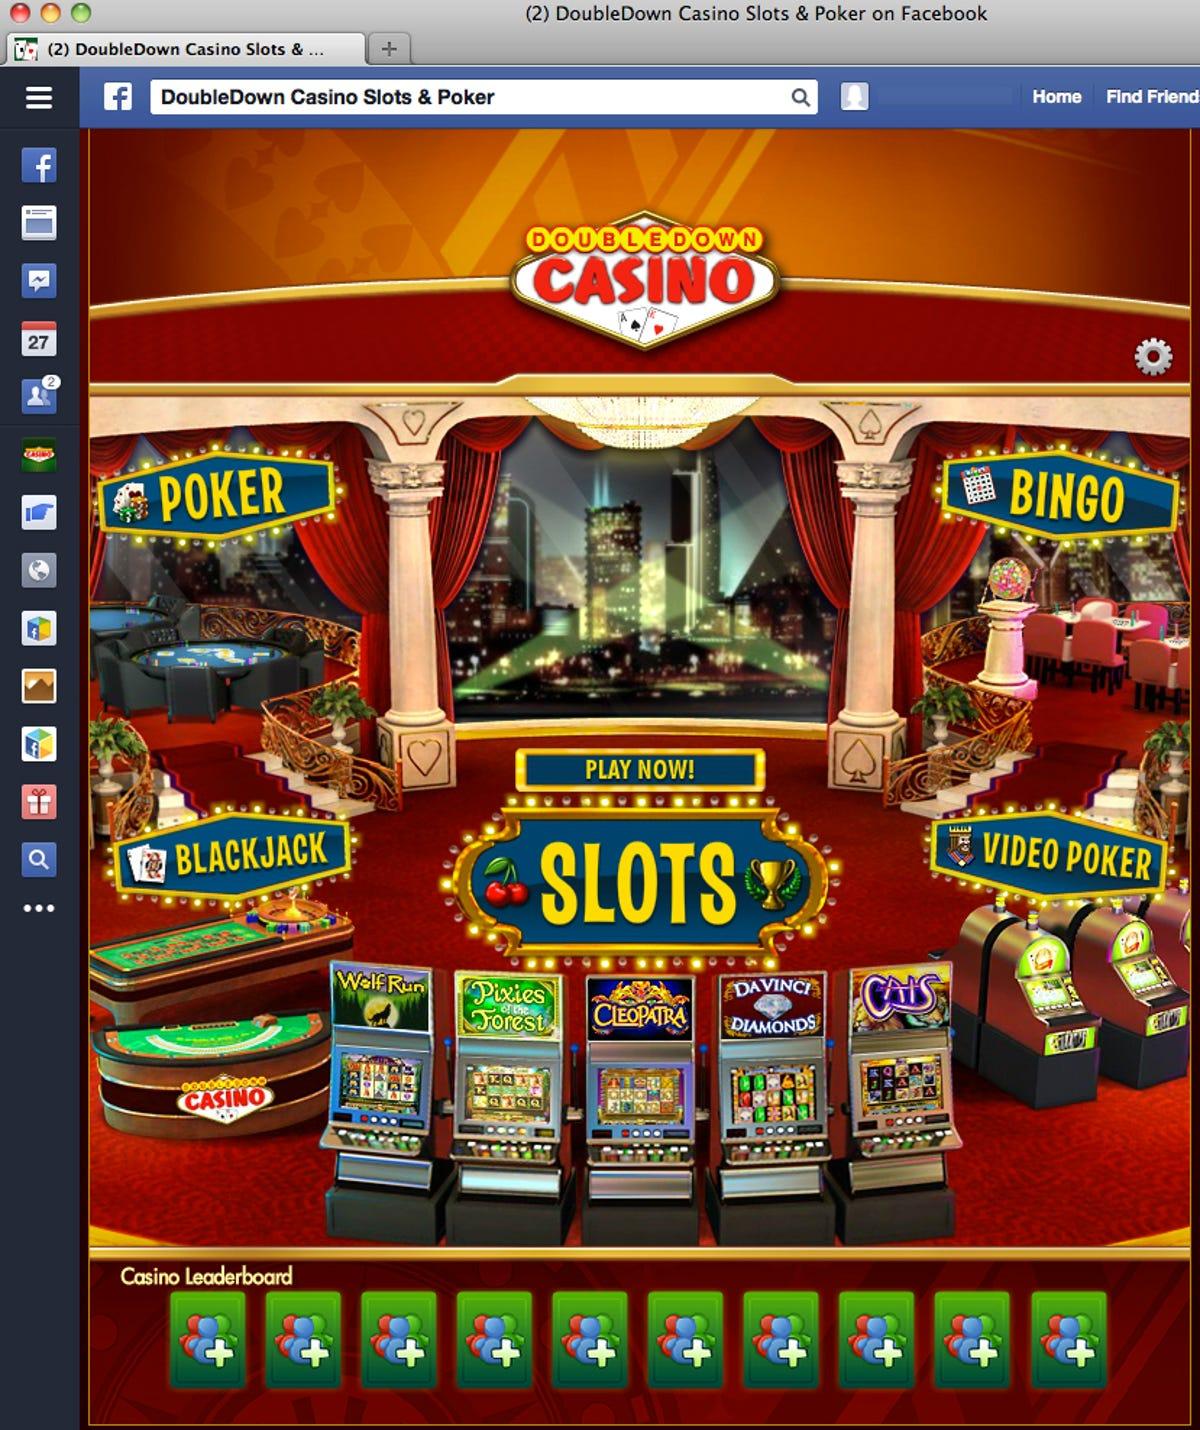 DoubleDown Casino, vaut-il la peine ?